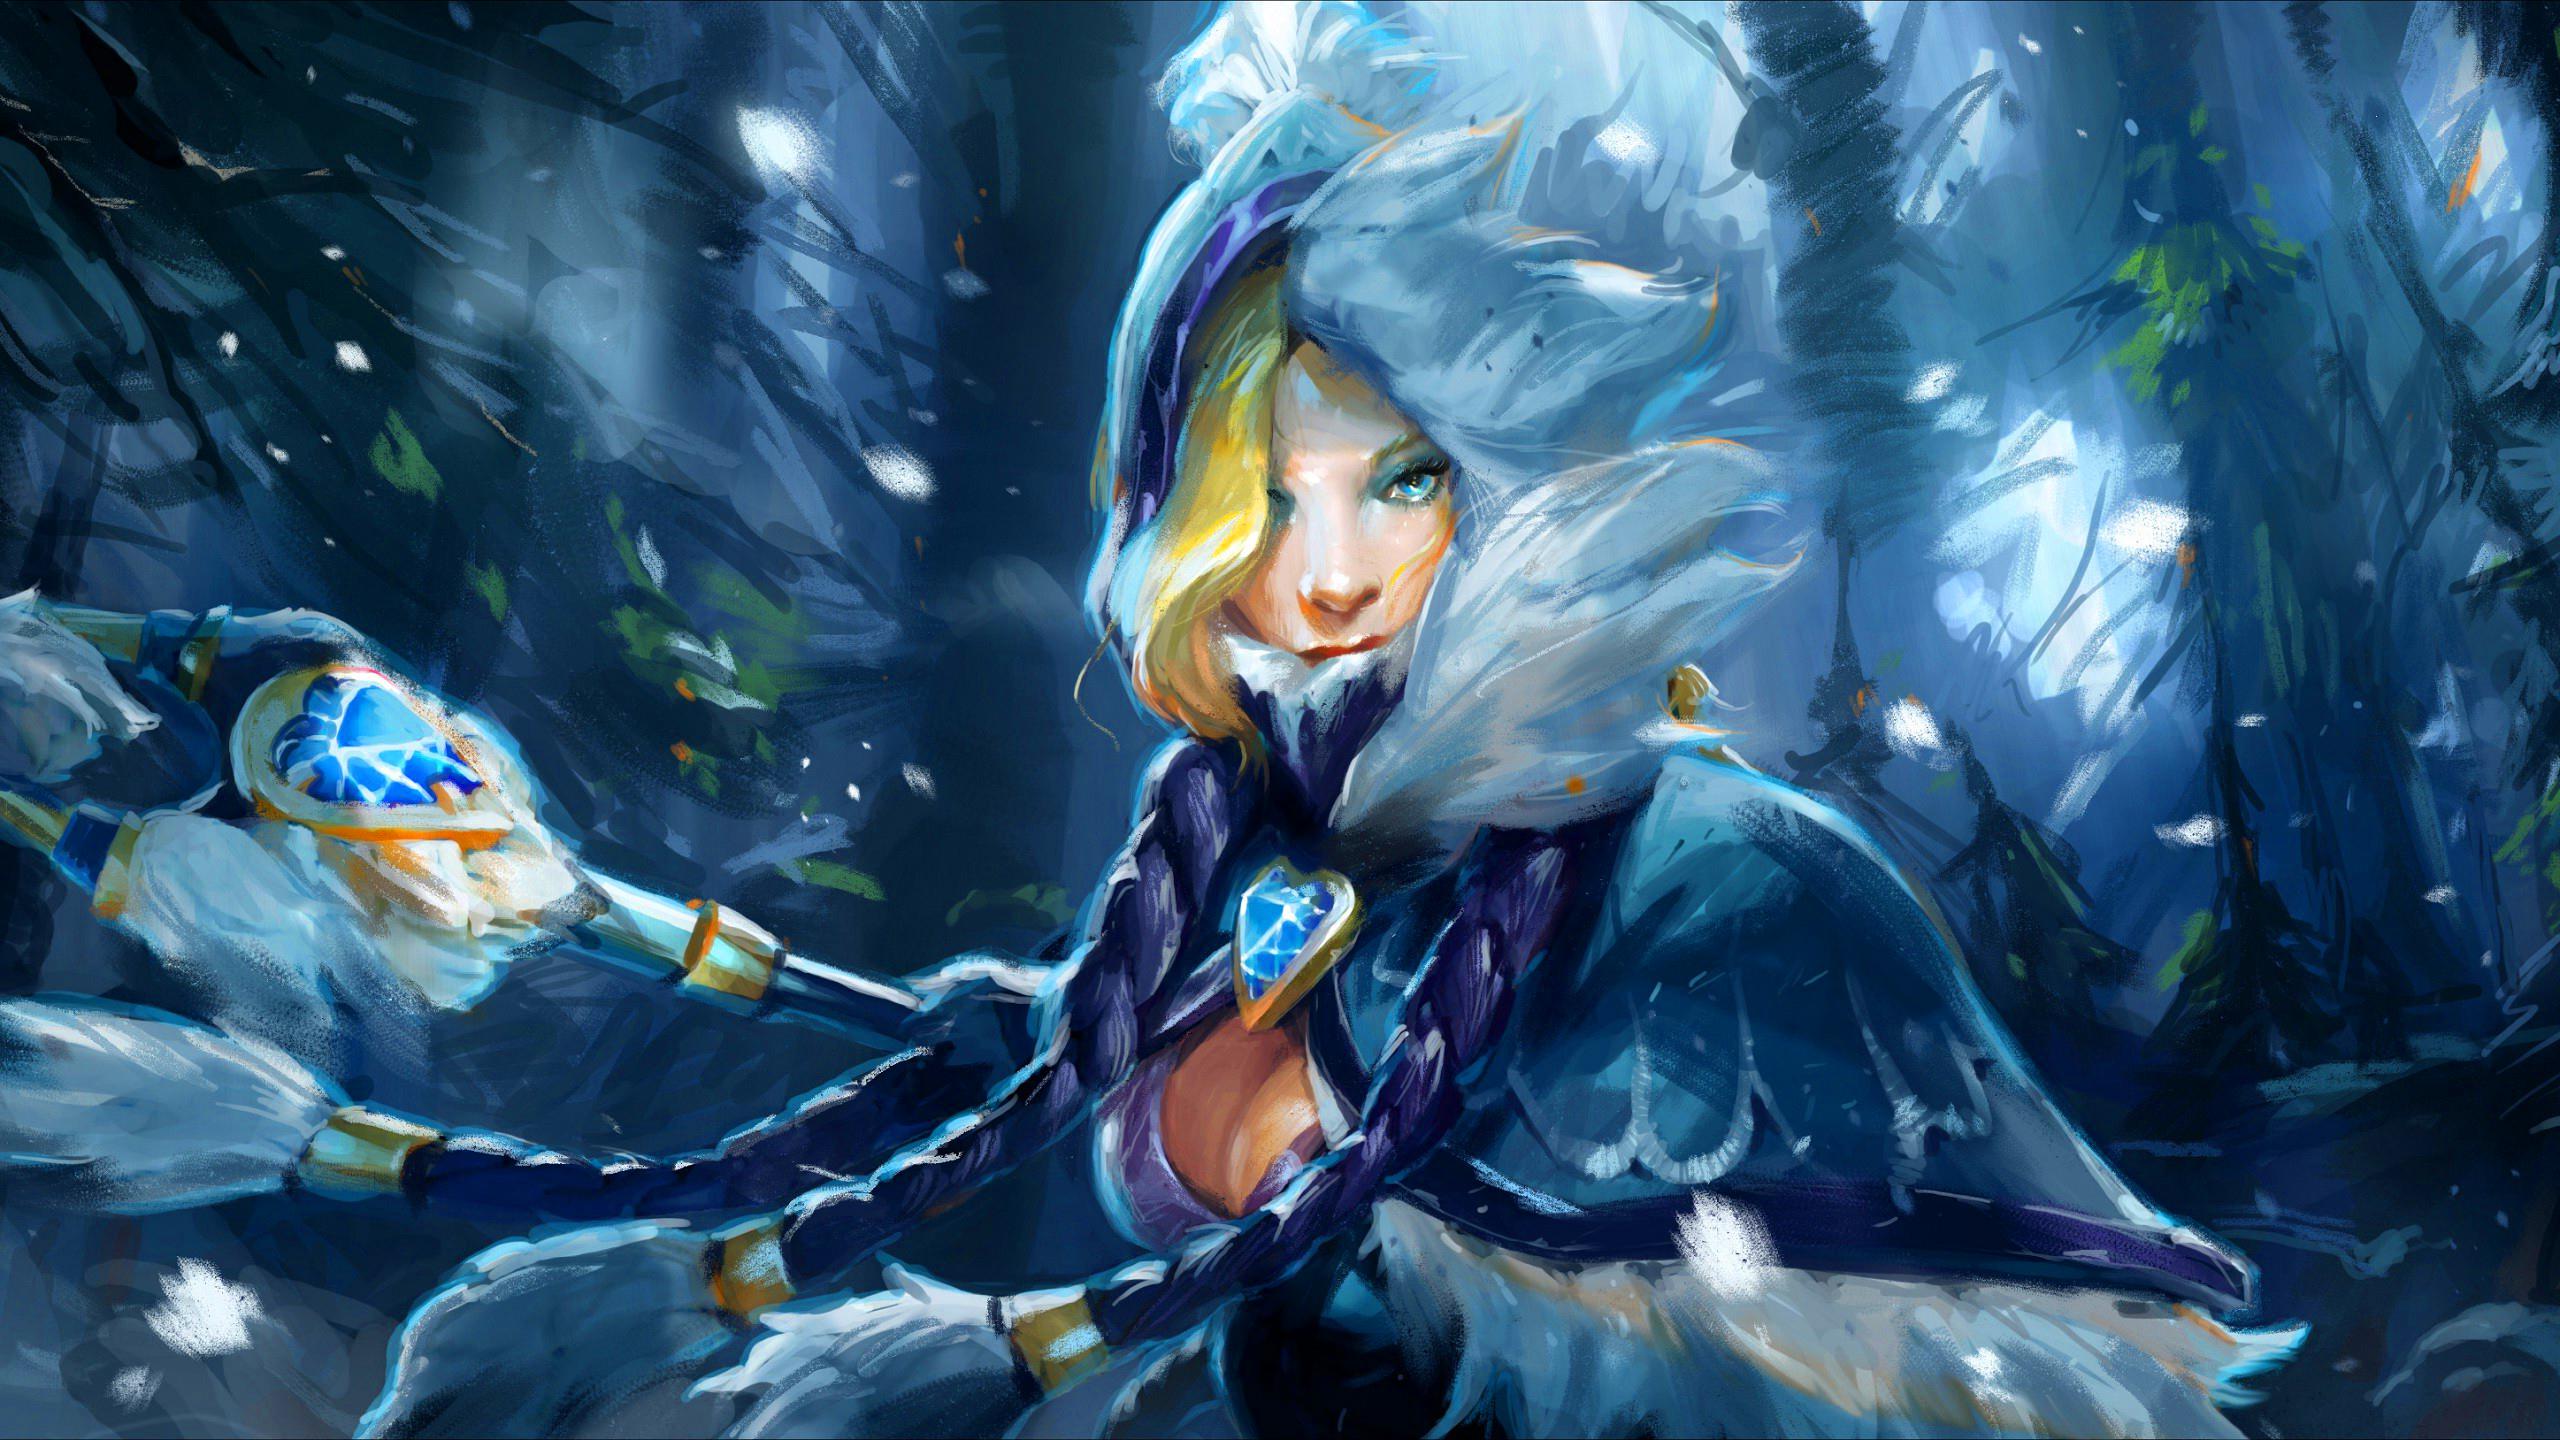 Dota 2 rylai the crystal maiden